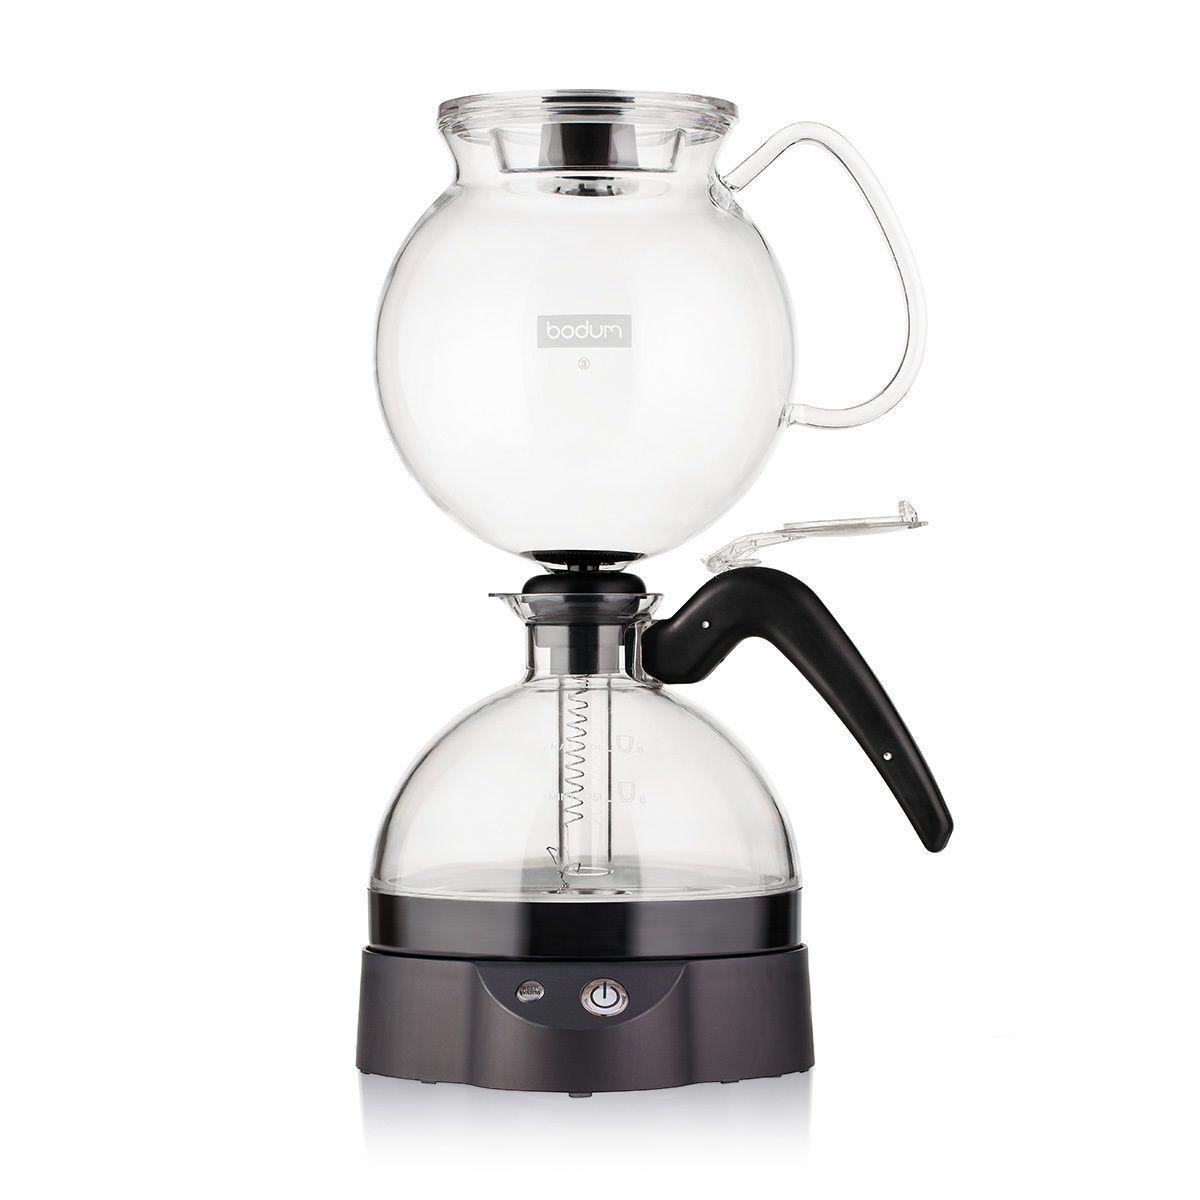 Syphon Coffee Maker ePEBO Bodum